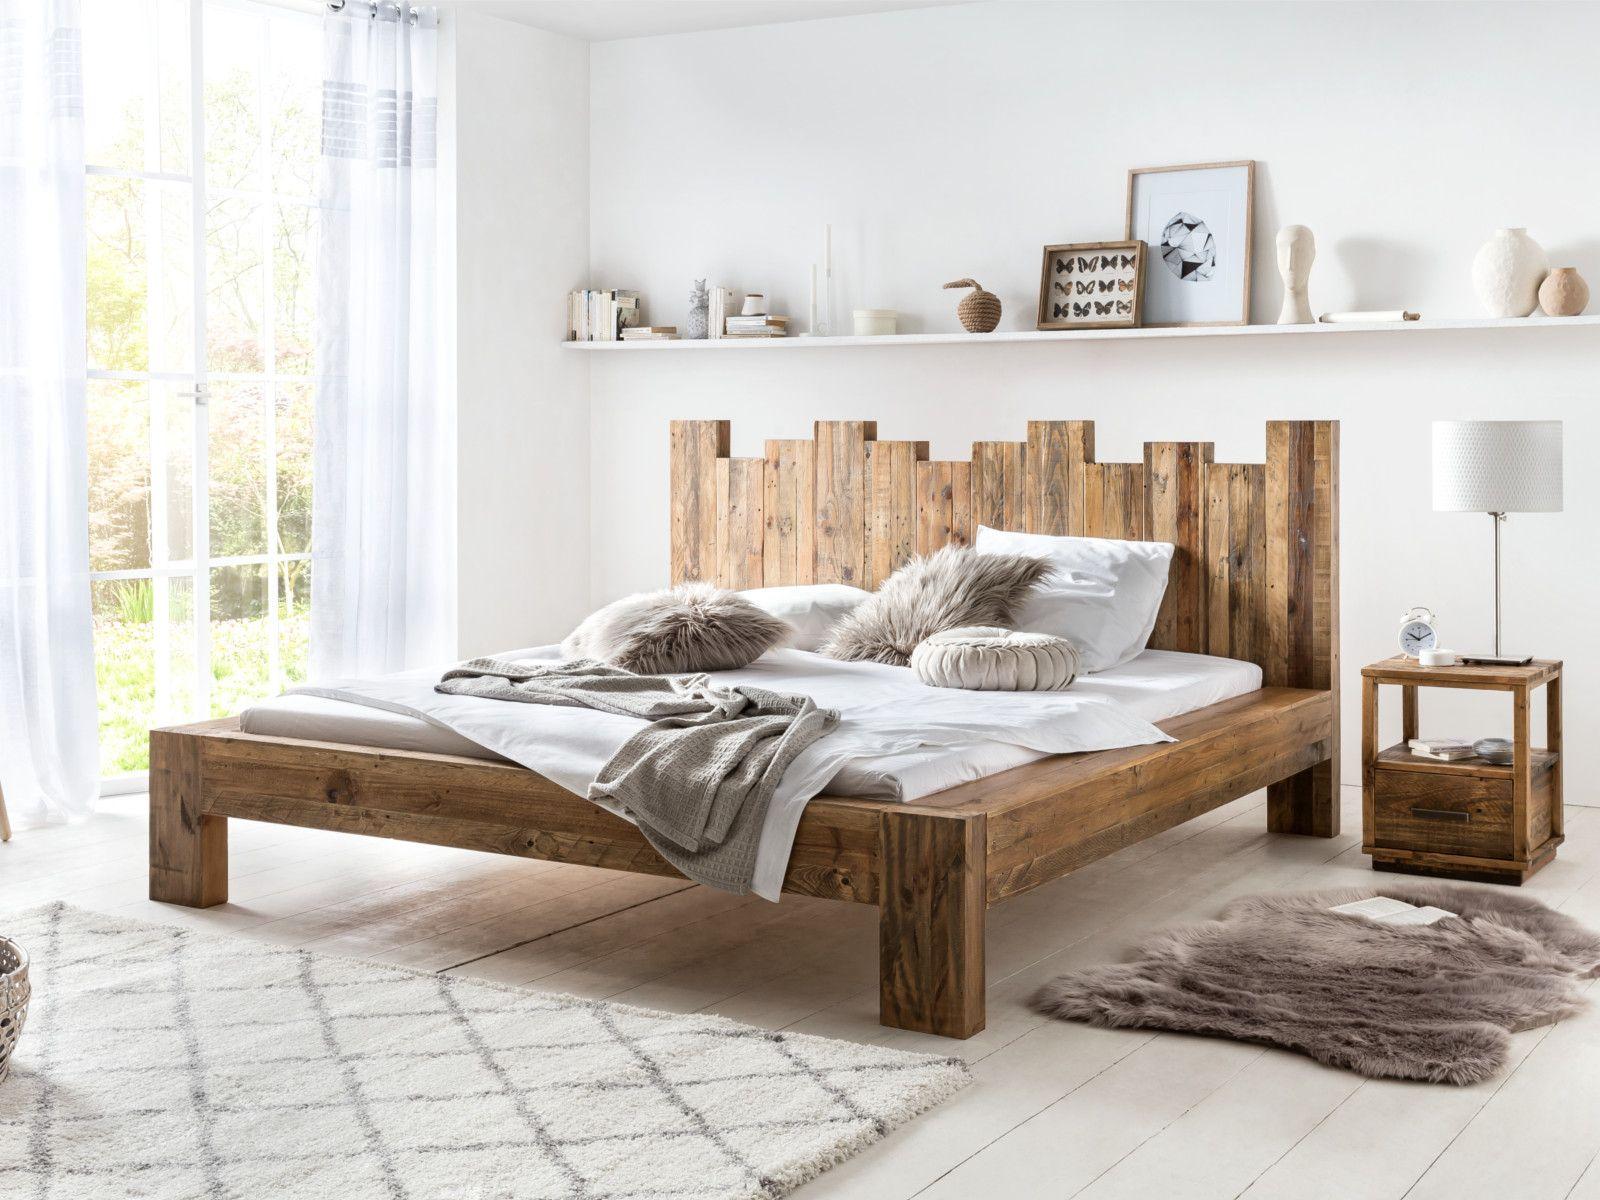 Holzbett Queensburgh in 2020 Holzbetten, Schlafzimmer